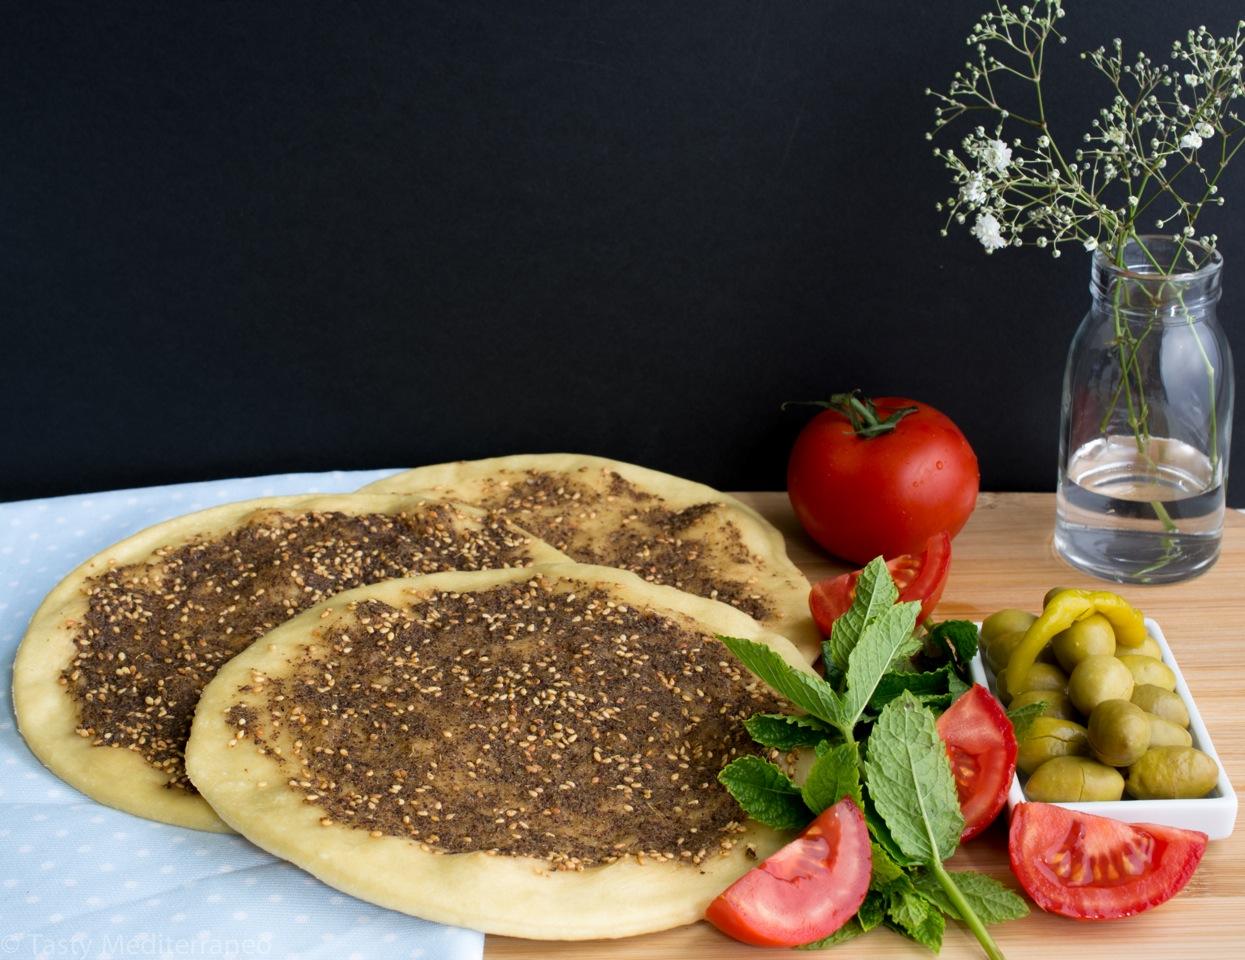 tasty-mediterraneo-zaatar-manouche-olive-oil-appetizer-healthy-snack-recipe-vegan-appetizer-savory